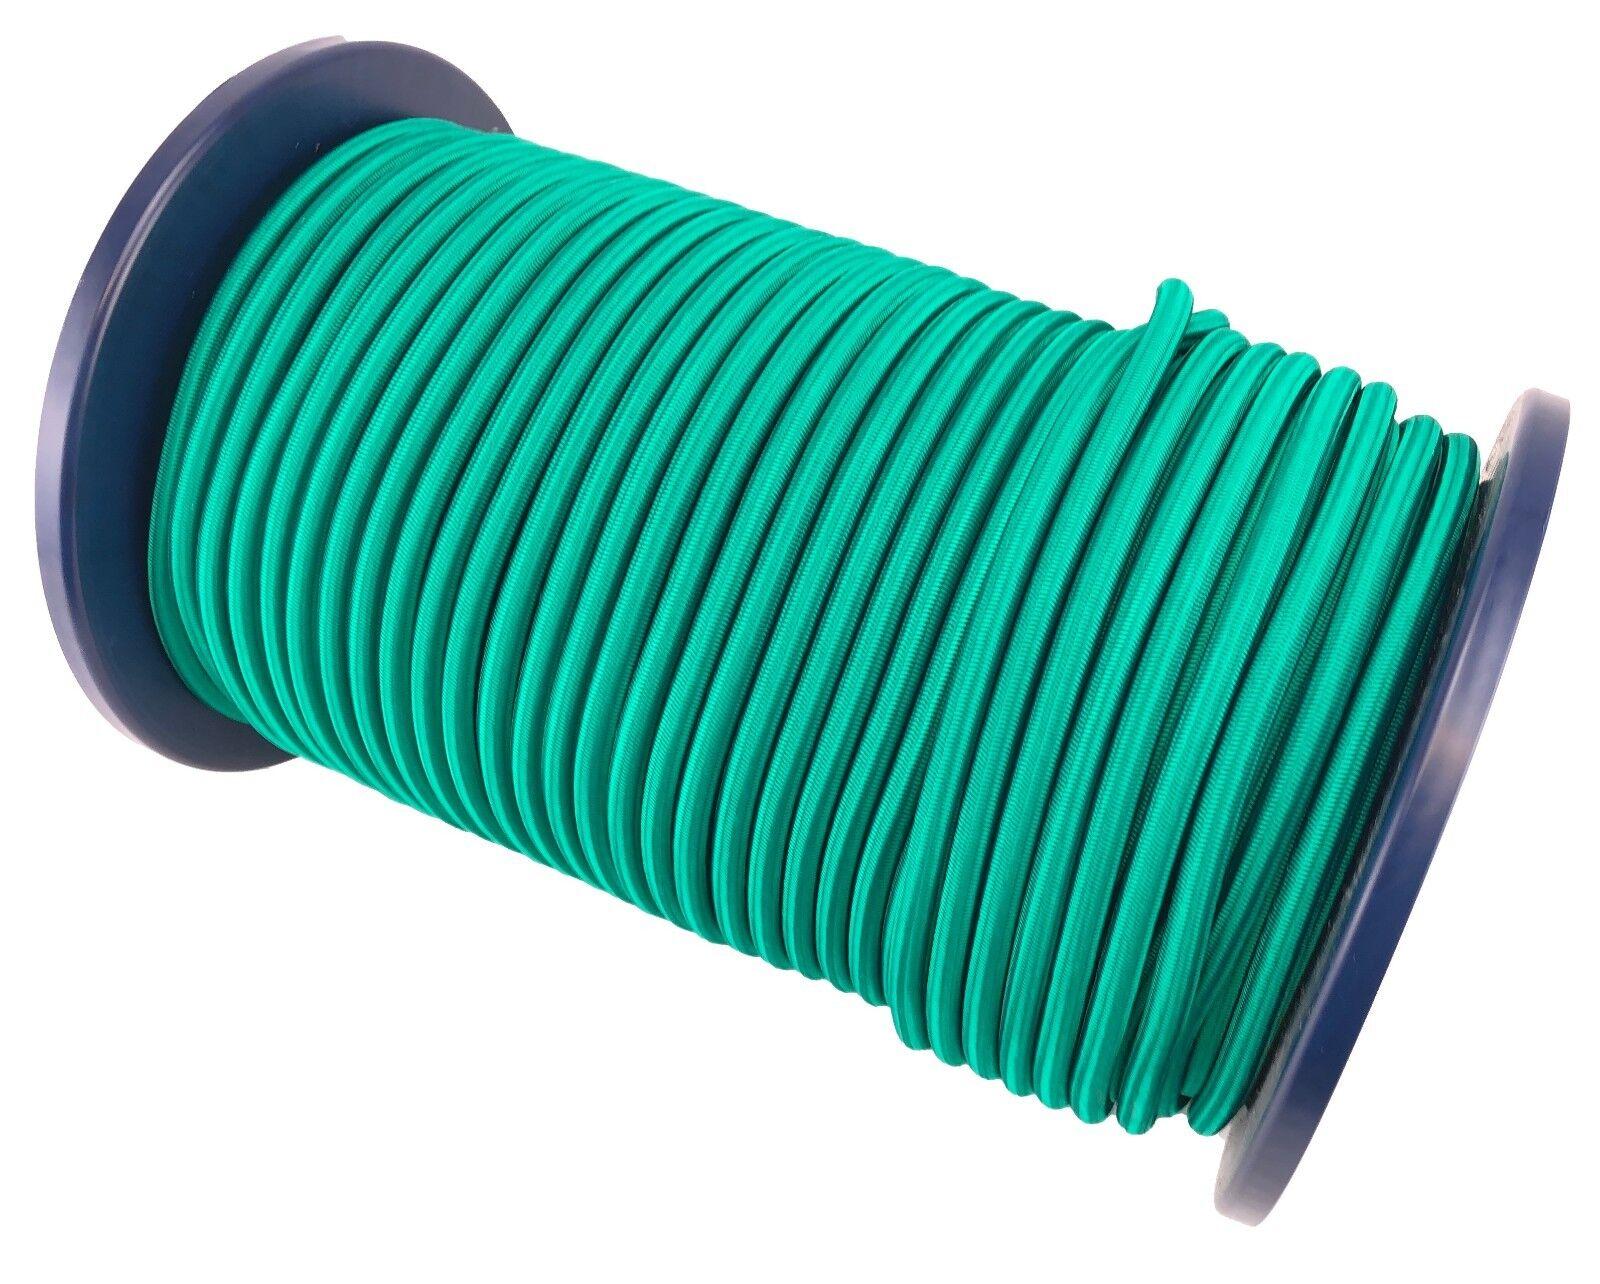 10mm Smaragdgrün Smaragdgrün Smaragdgrün Elastischer Gummizug Seil Gummiseil Festbinden UV Stabil 5e1678